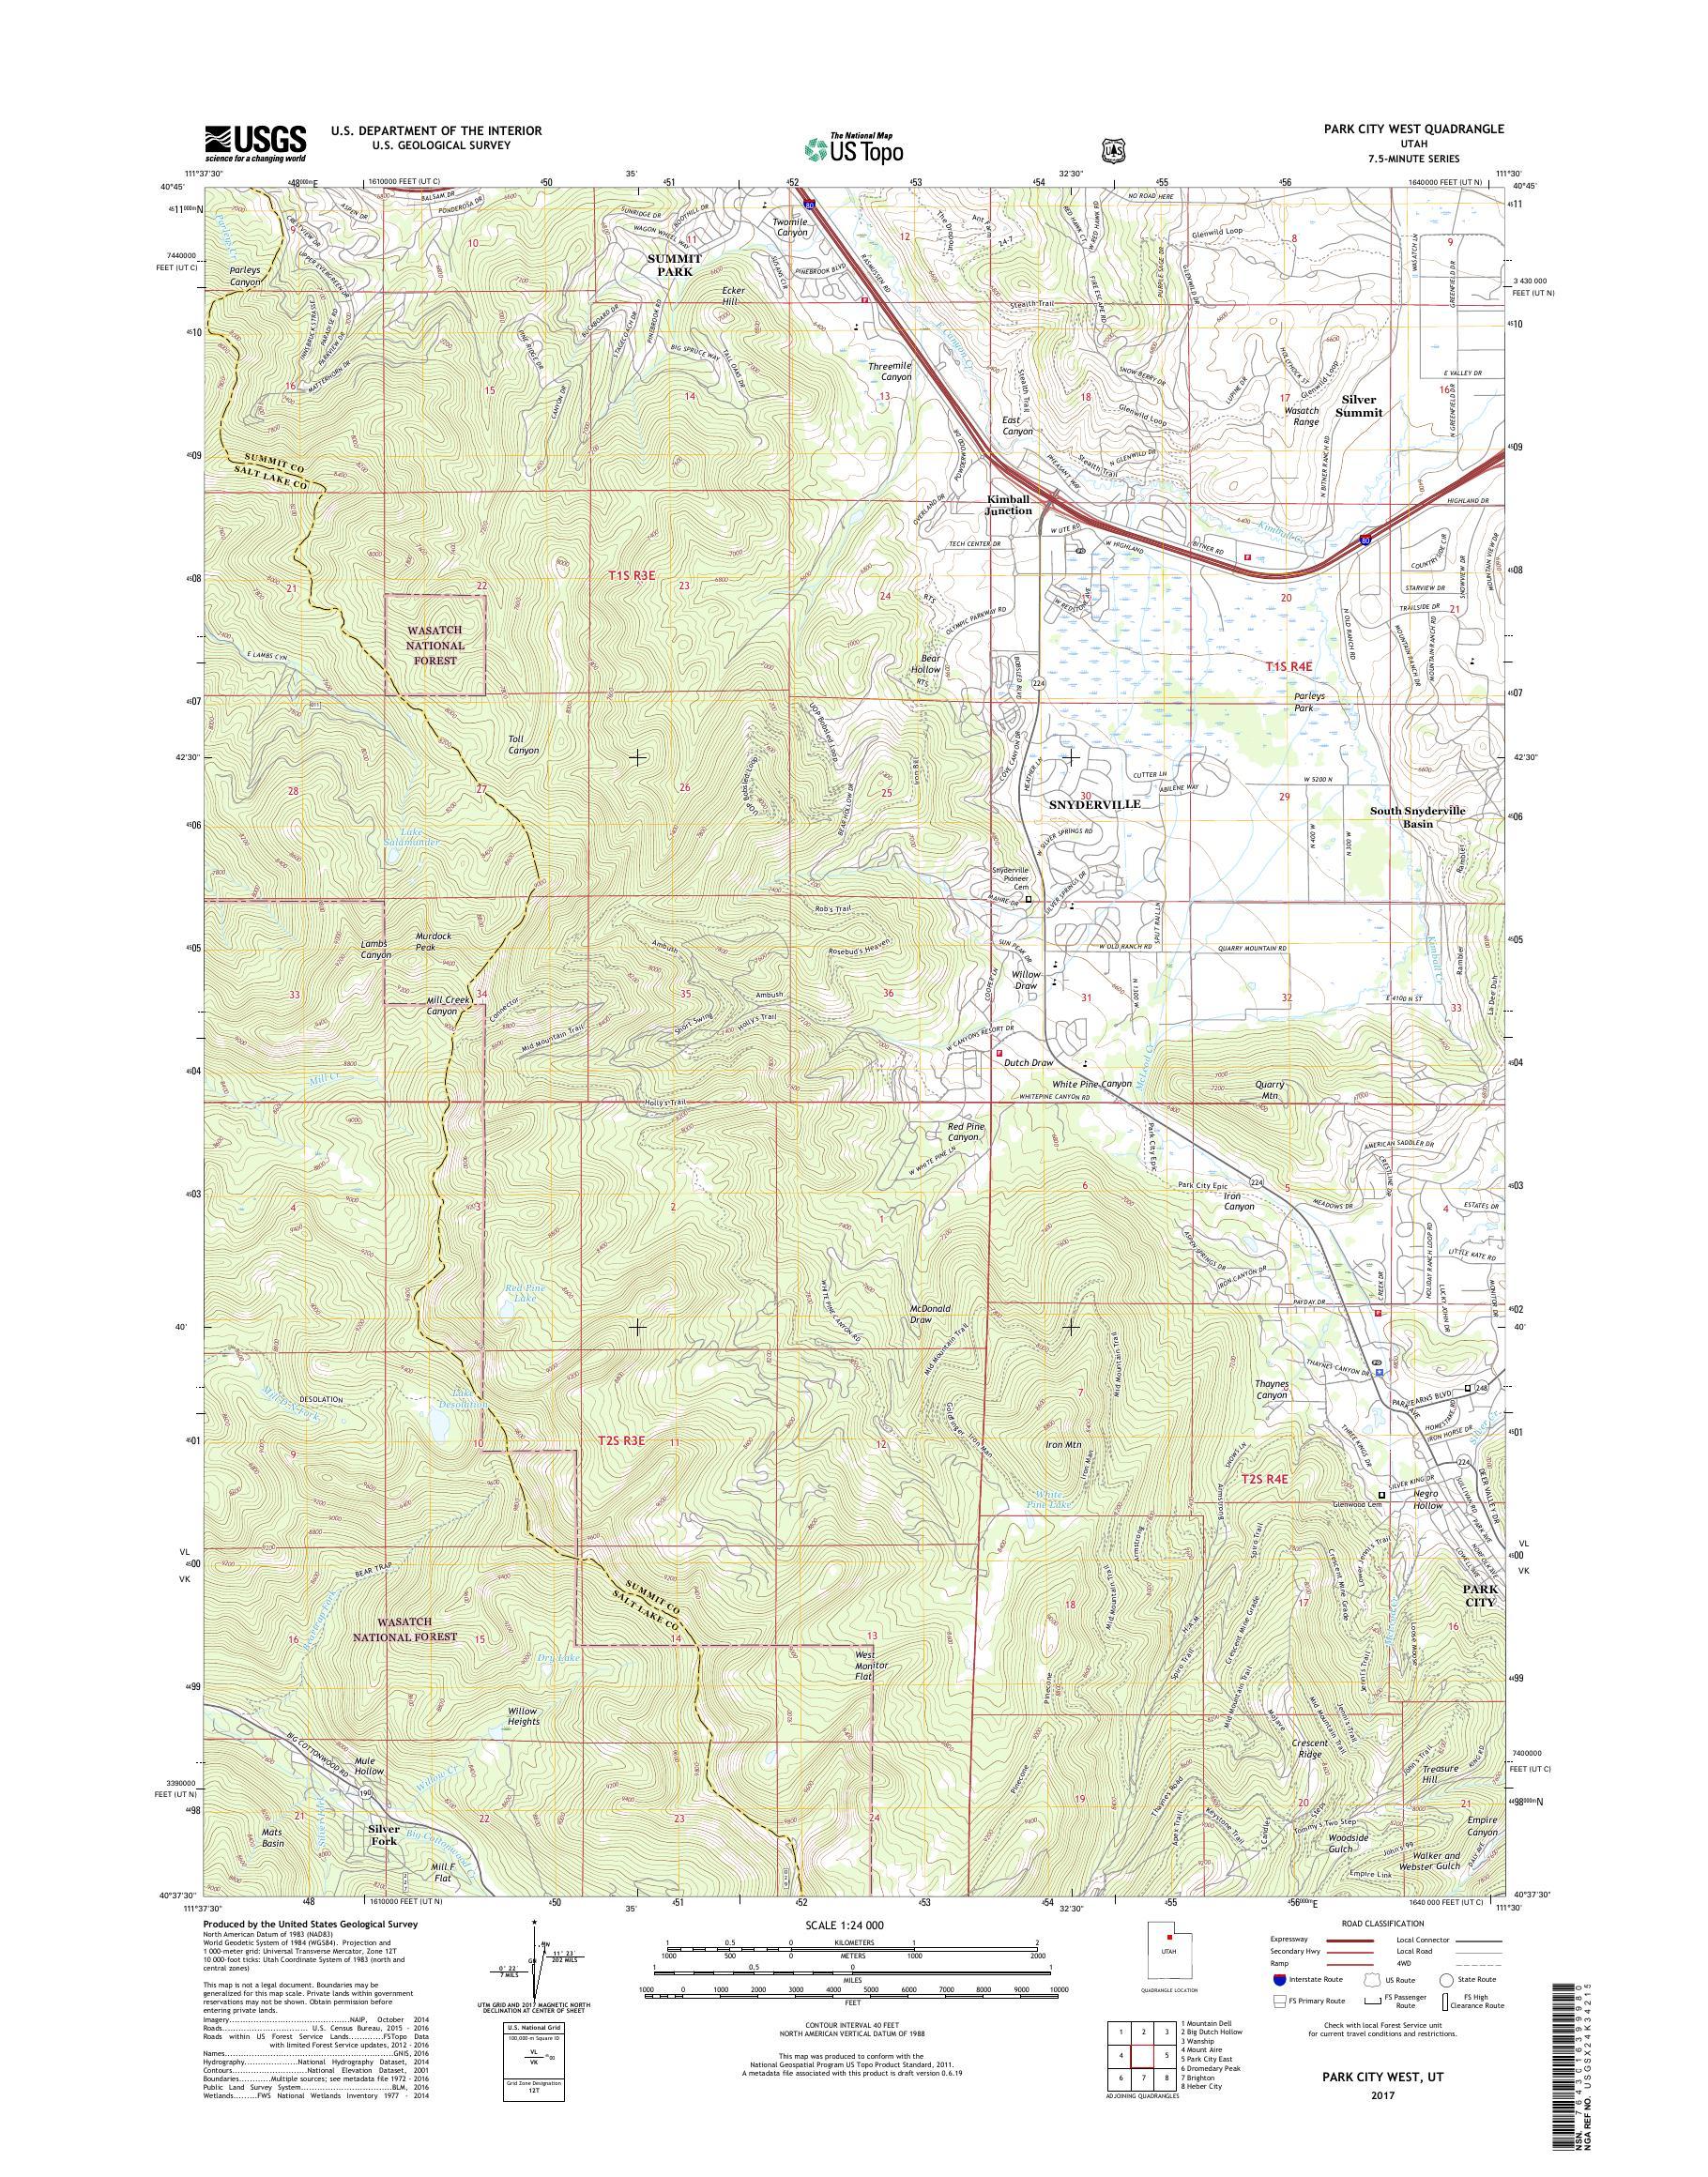 Mytopo Park City West Utah Usgs Quad Topo Map